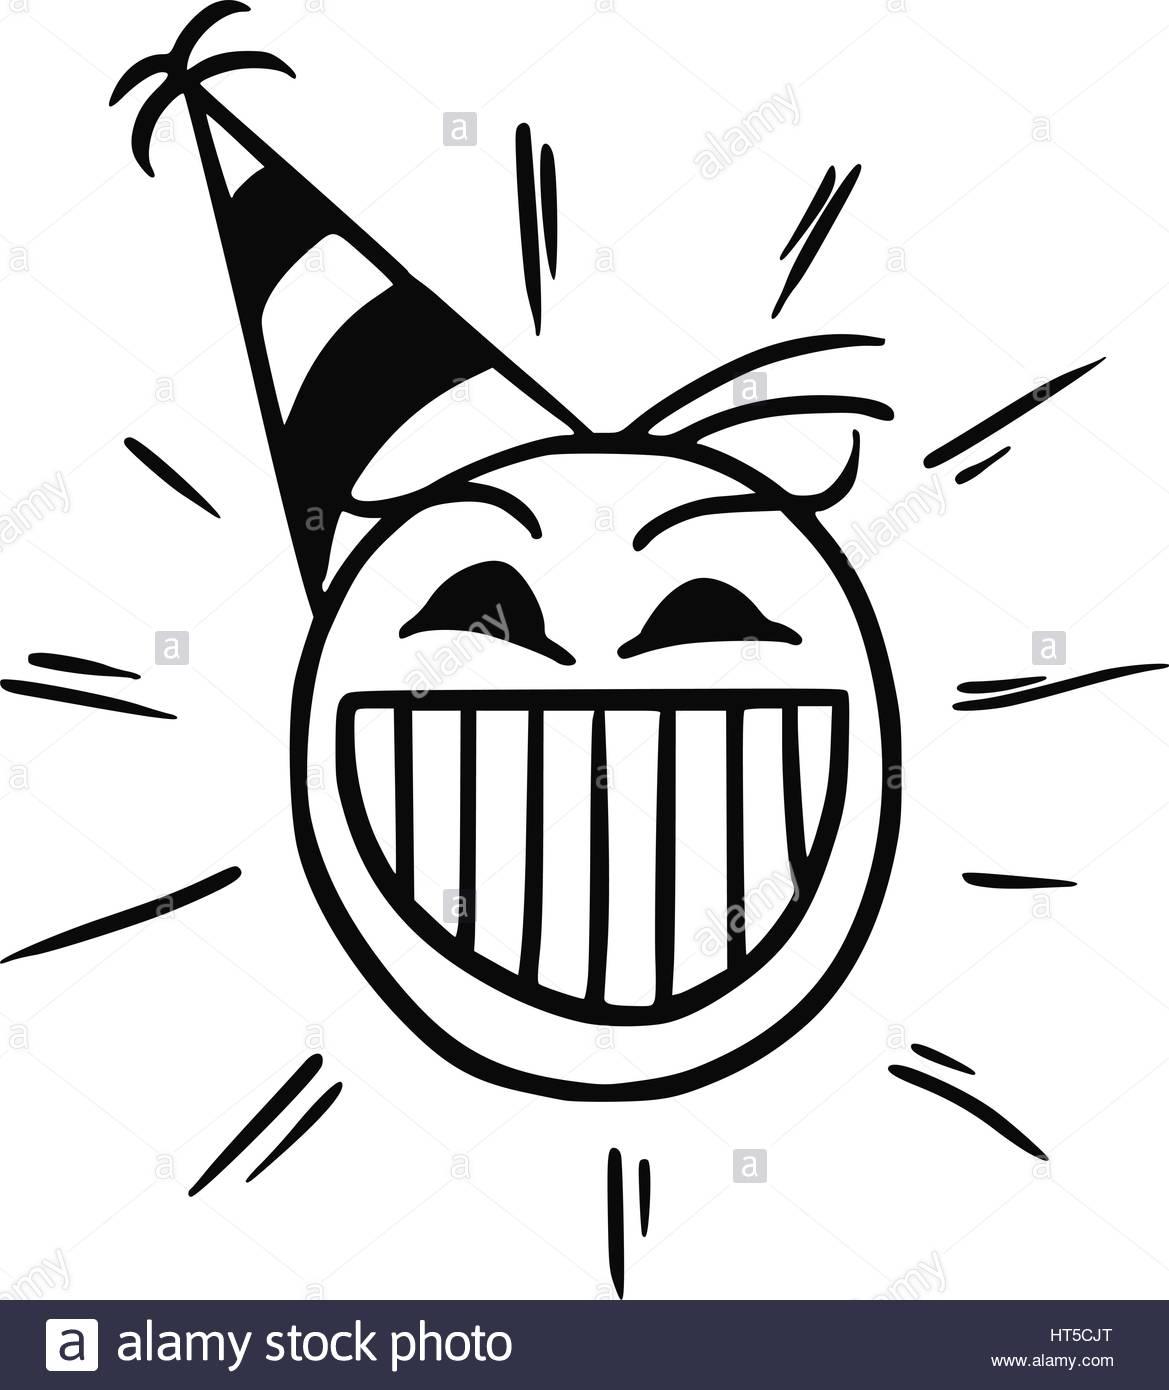 1169x1390 Cartoon Vector Stickman Happy Head With Party Hat Cap Stock Vector